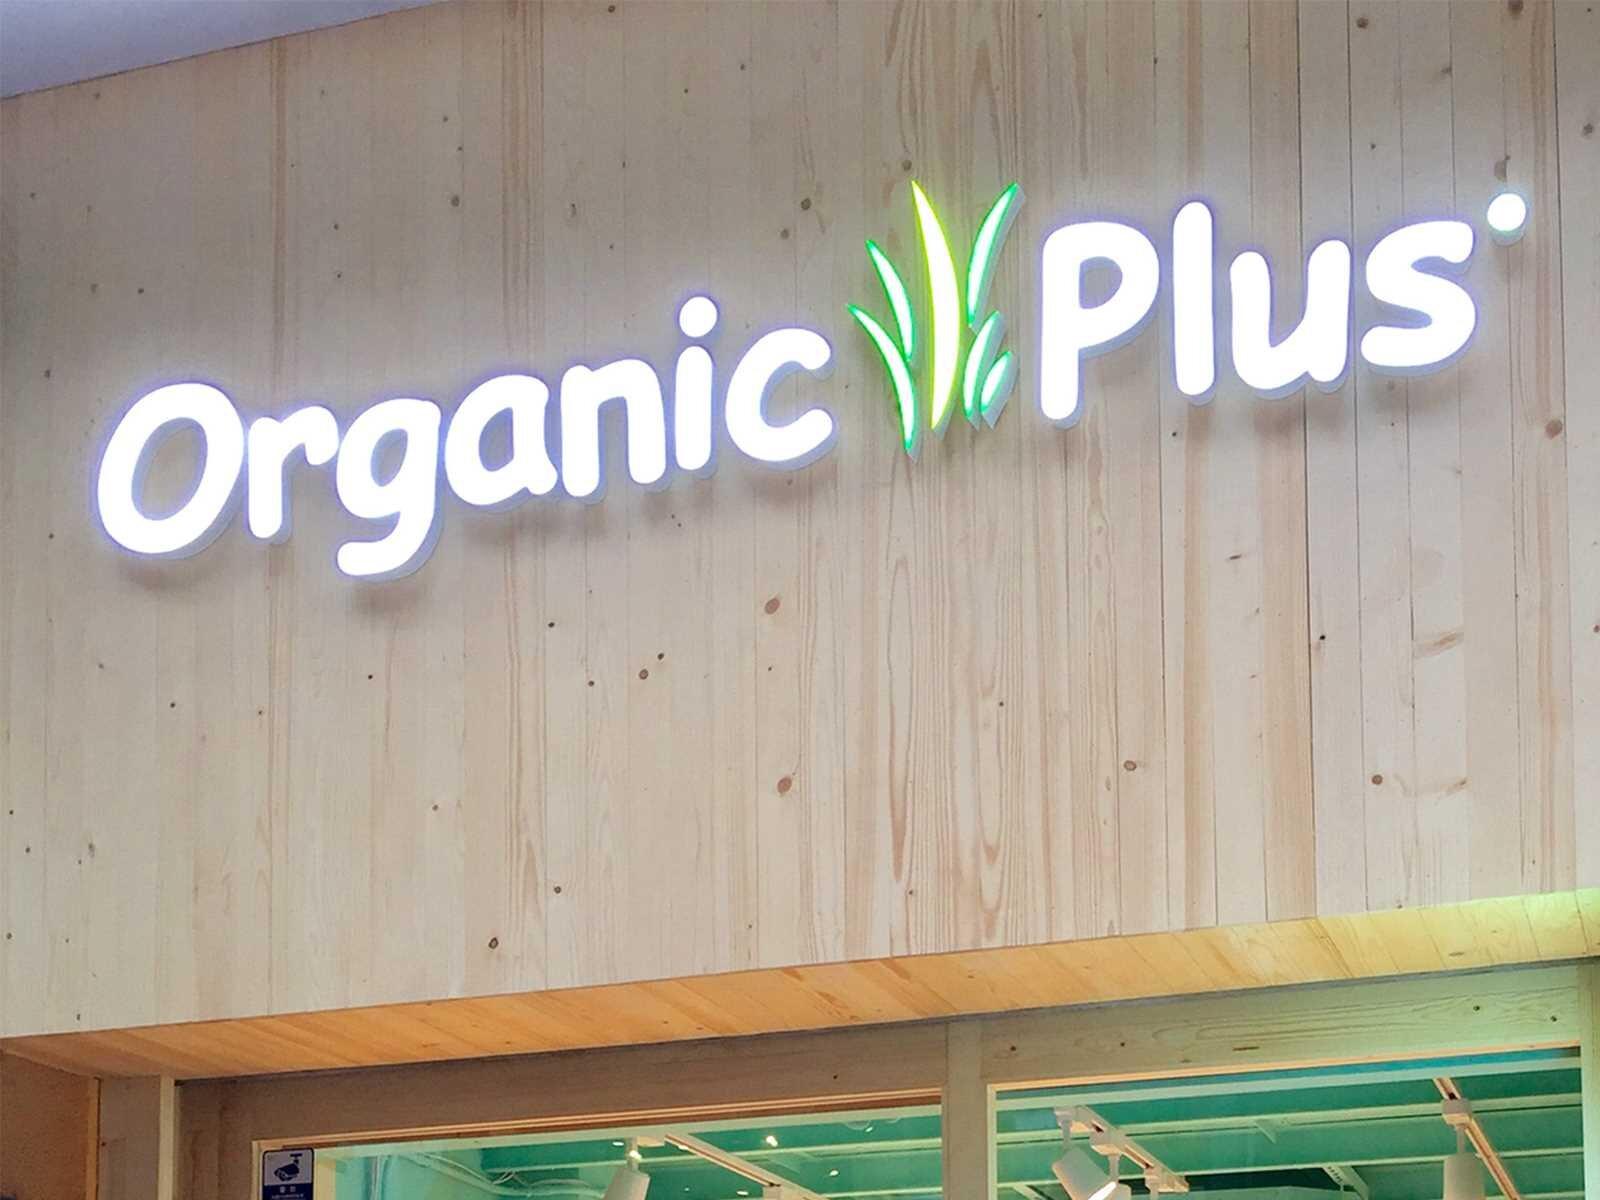 Organic Plus   Happy Valley Shop  Business Hours:10am-8pm Mobile:2755 1880 Email:hv@organicplus.com.hk Address:No. 18A, Yik Yam Street,  Happy Valley, H.K.